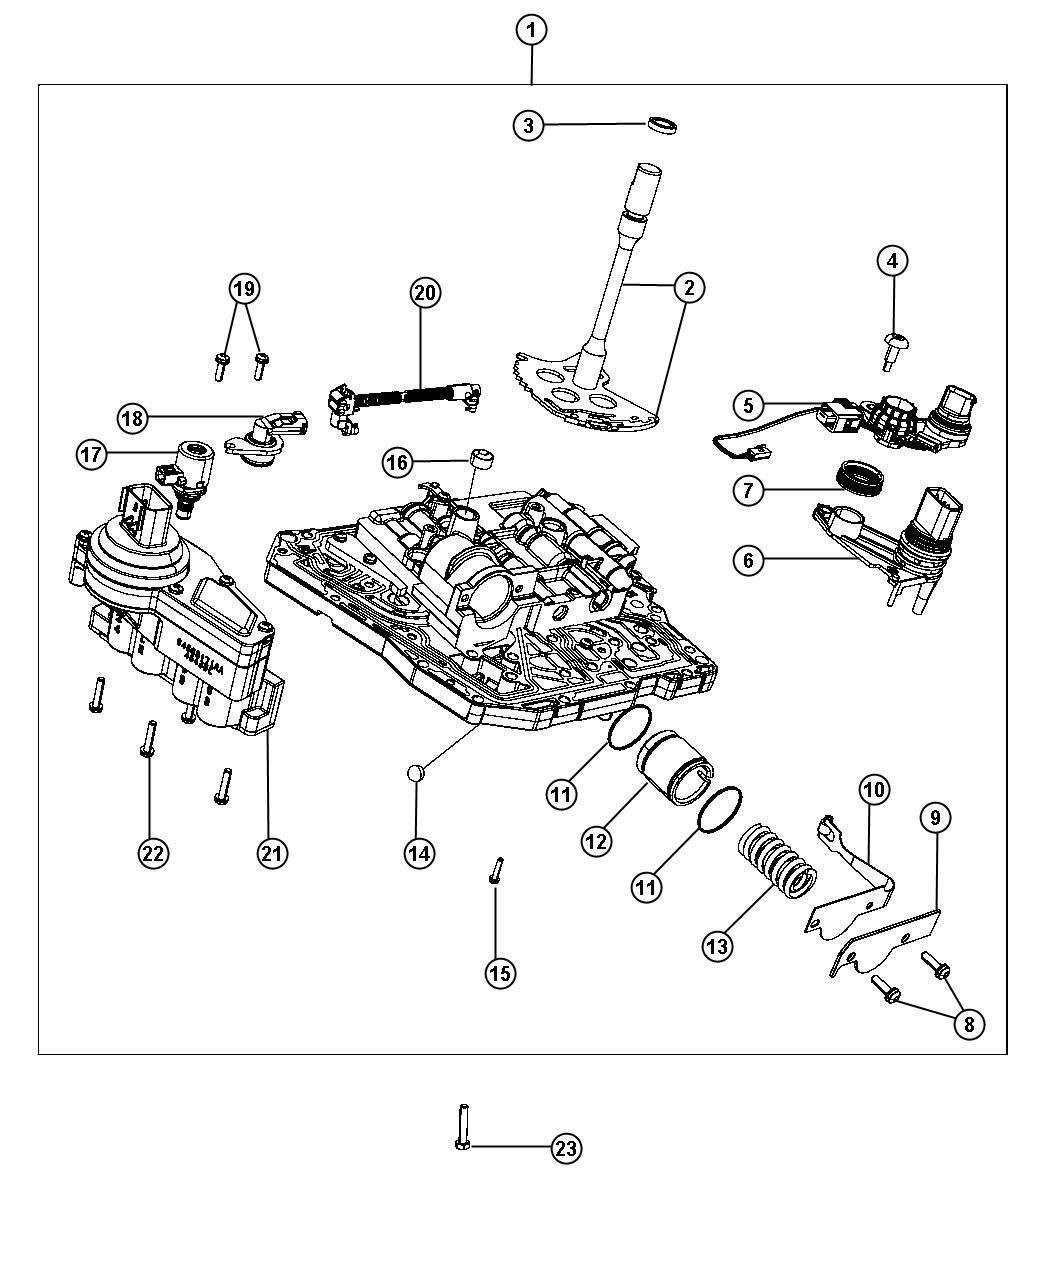 Dodge Charger Solenoid  Solenoid Package  Transmission  Valve Body